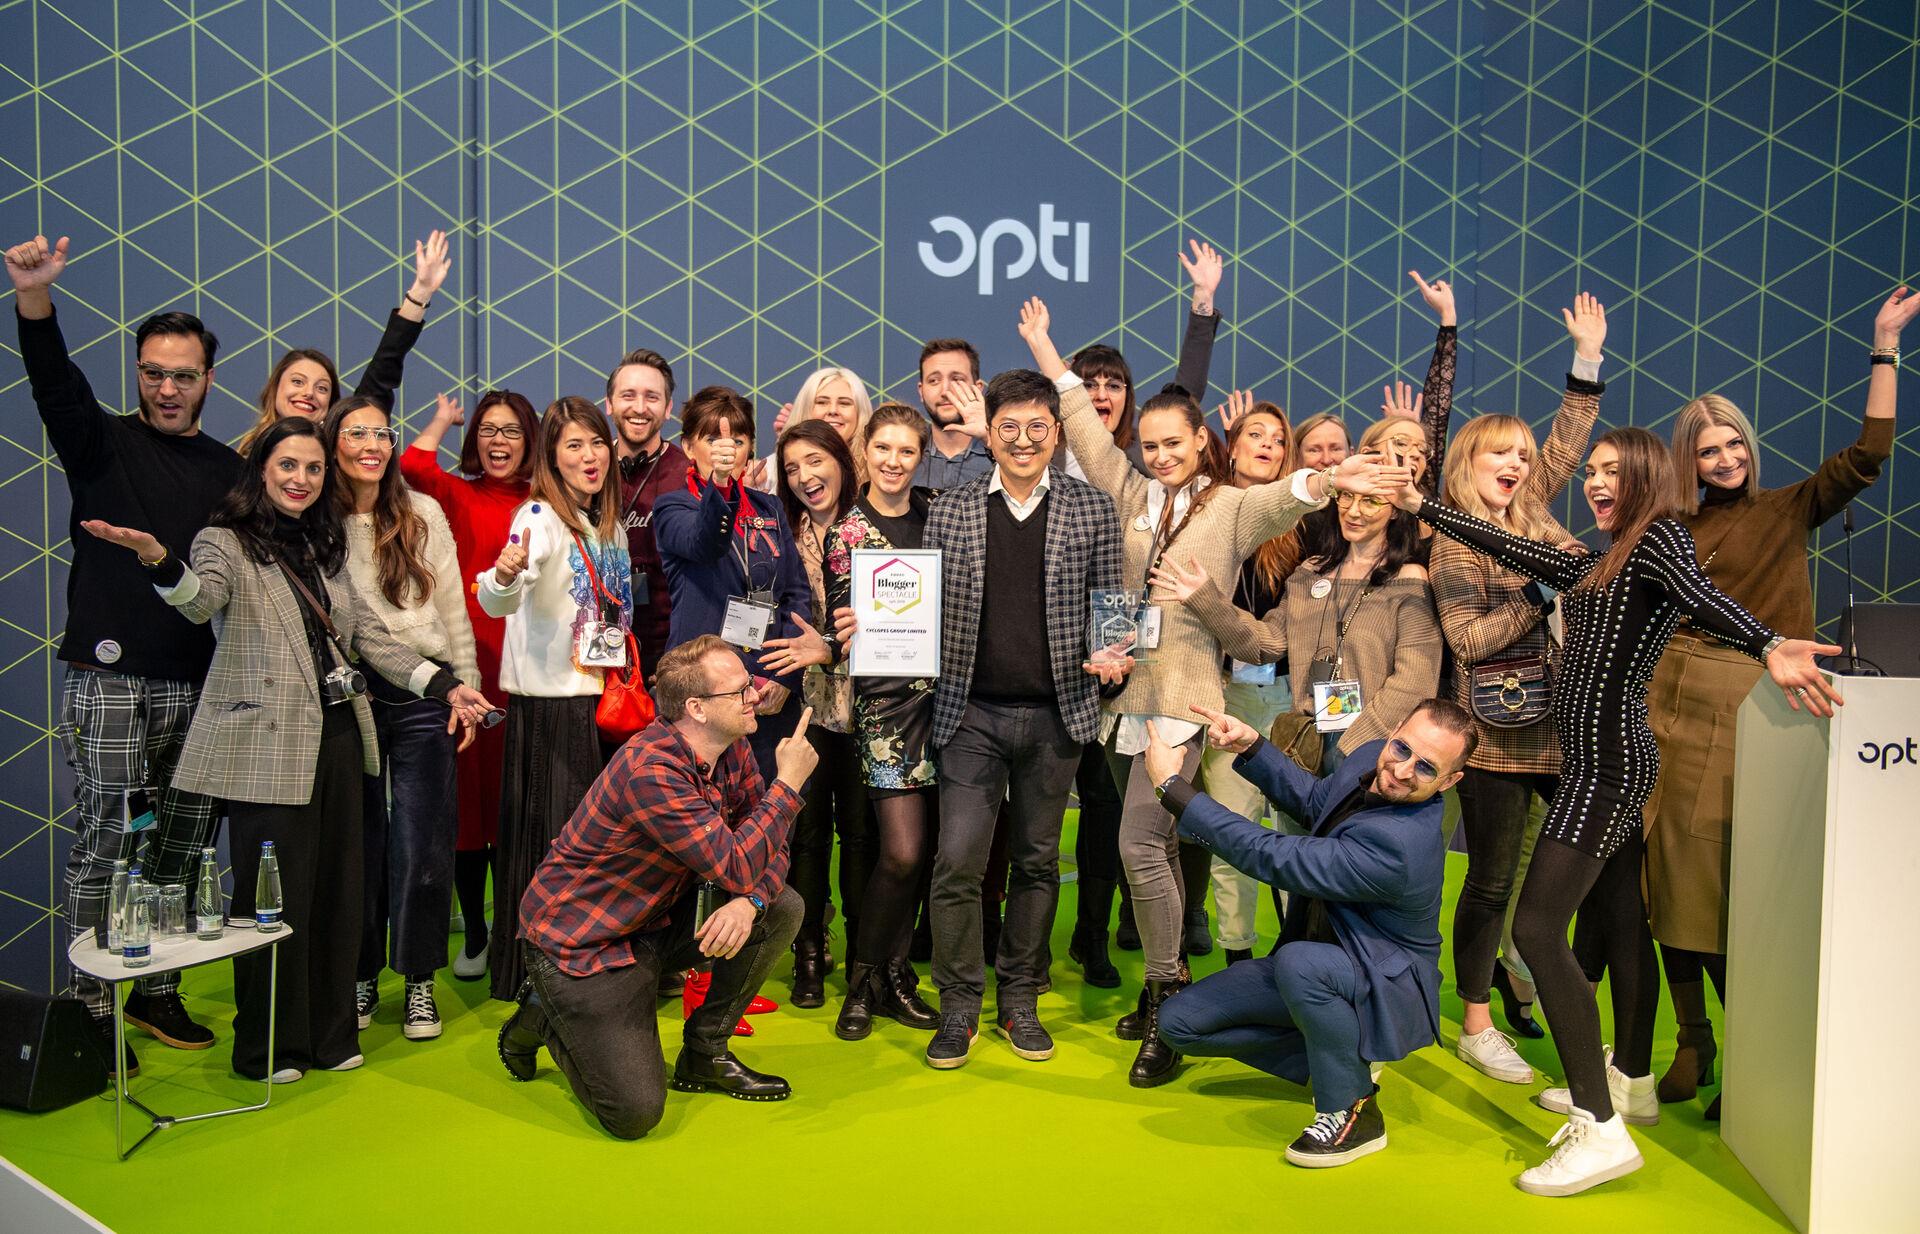 Opti Munich blogger spectacle award 2020